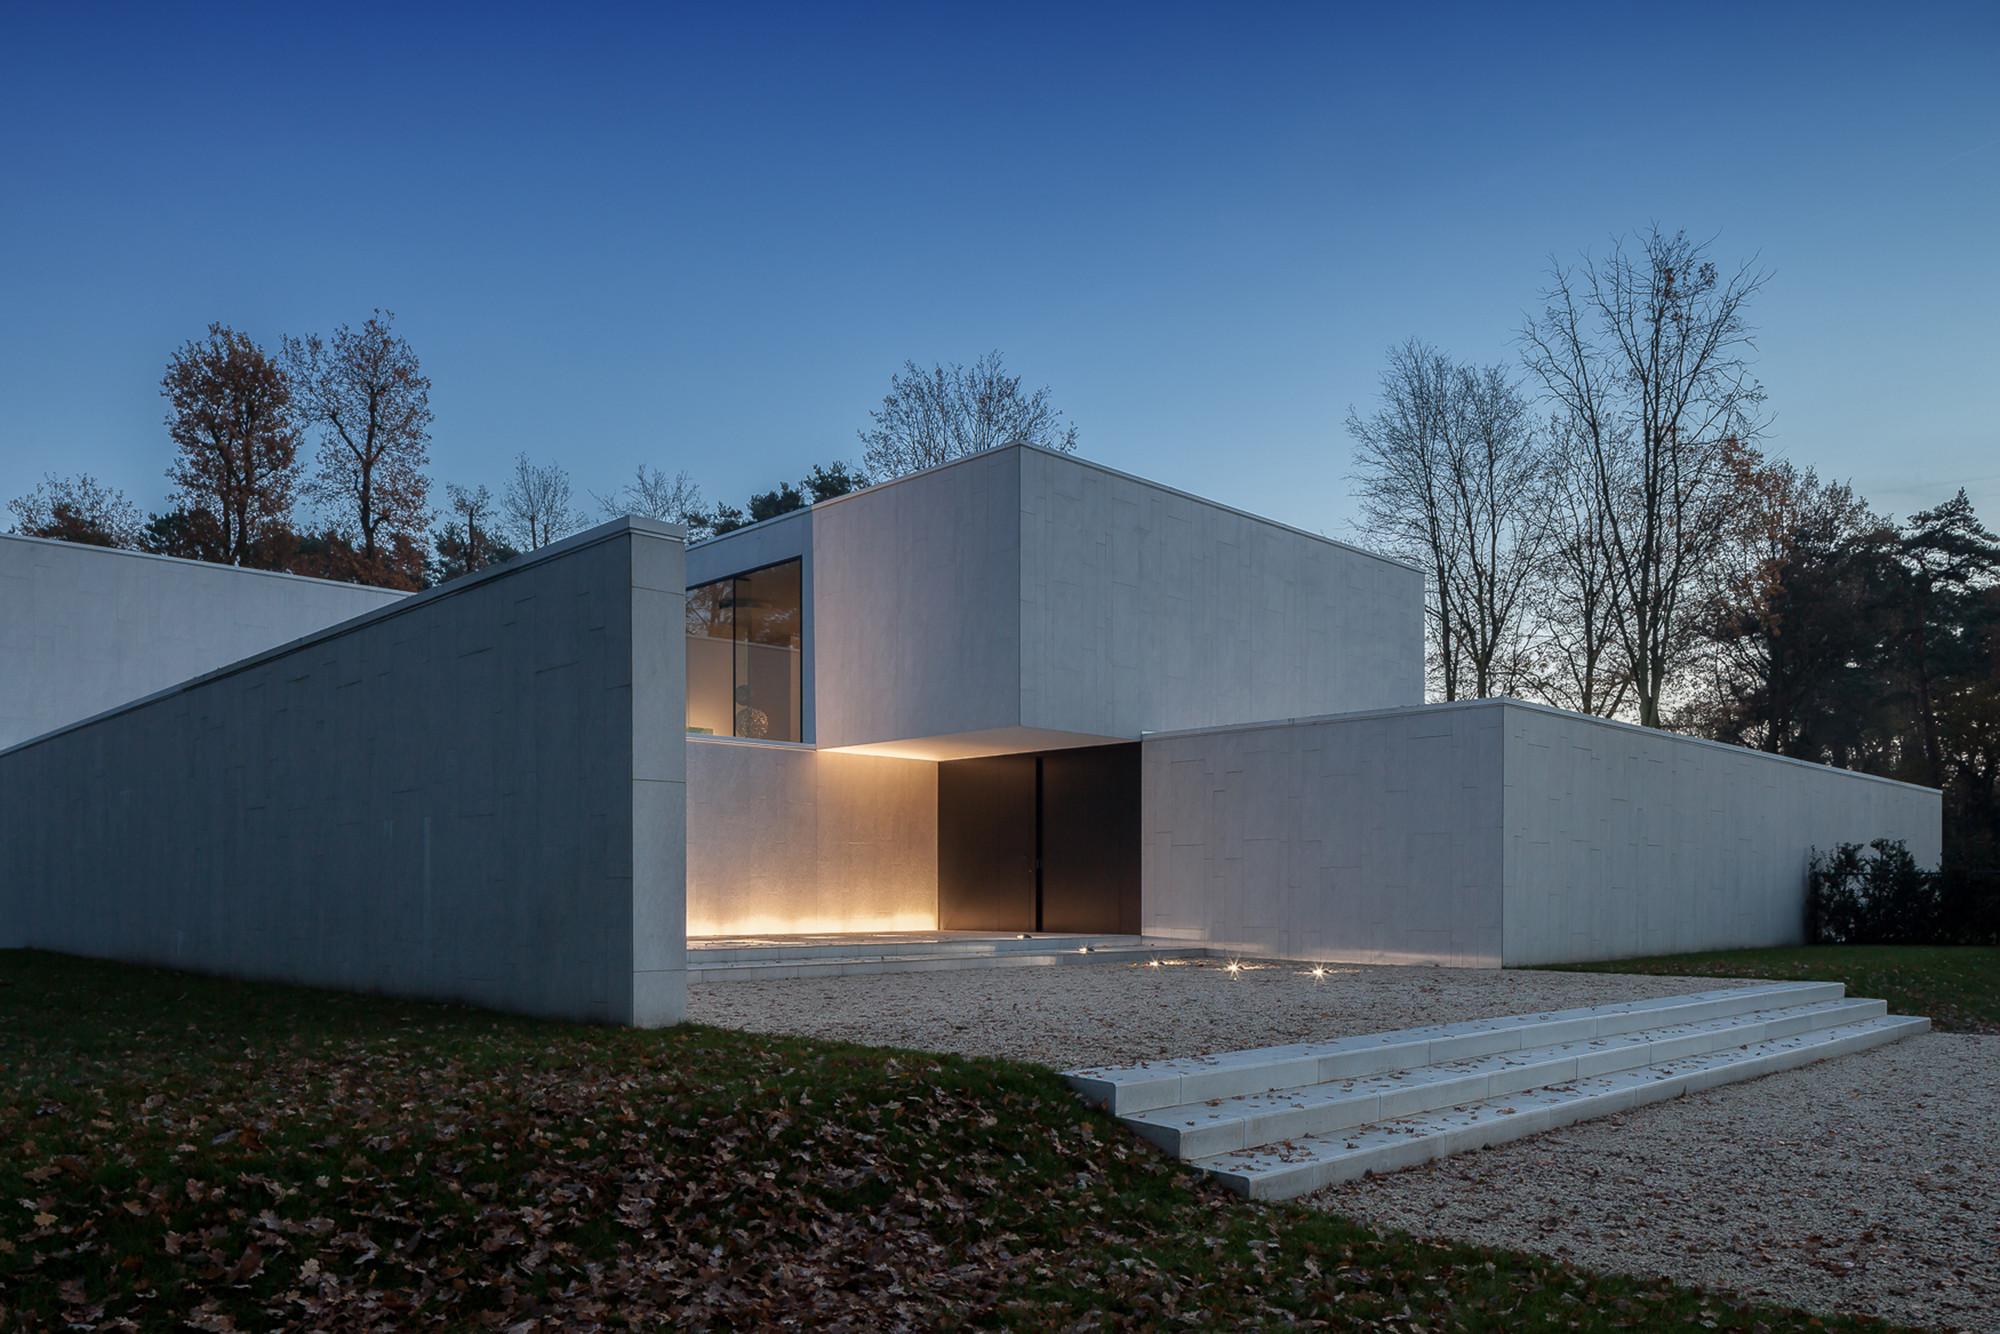 Galer a de residencia dm cubyc architects bvba 11 for Mot architecture